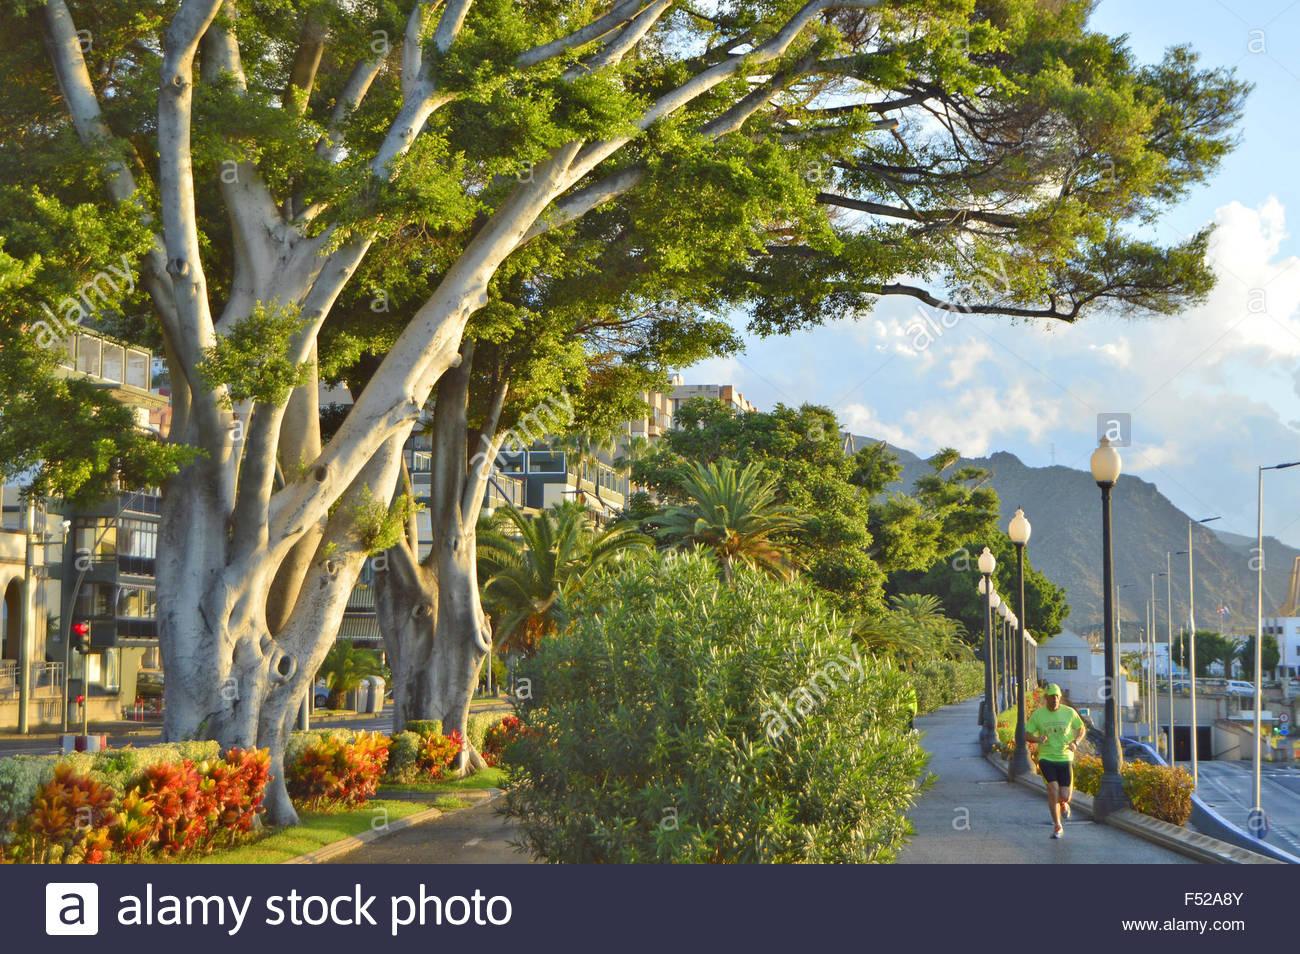 Hafen Promenade Allee der Bäume in Santa Cruz De Tenerife-Kanarische Inseln-Spanien Stockbild